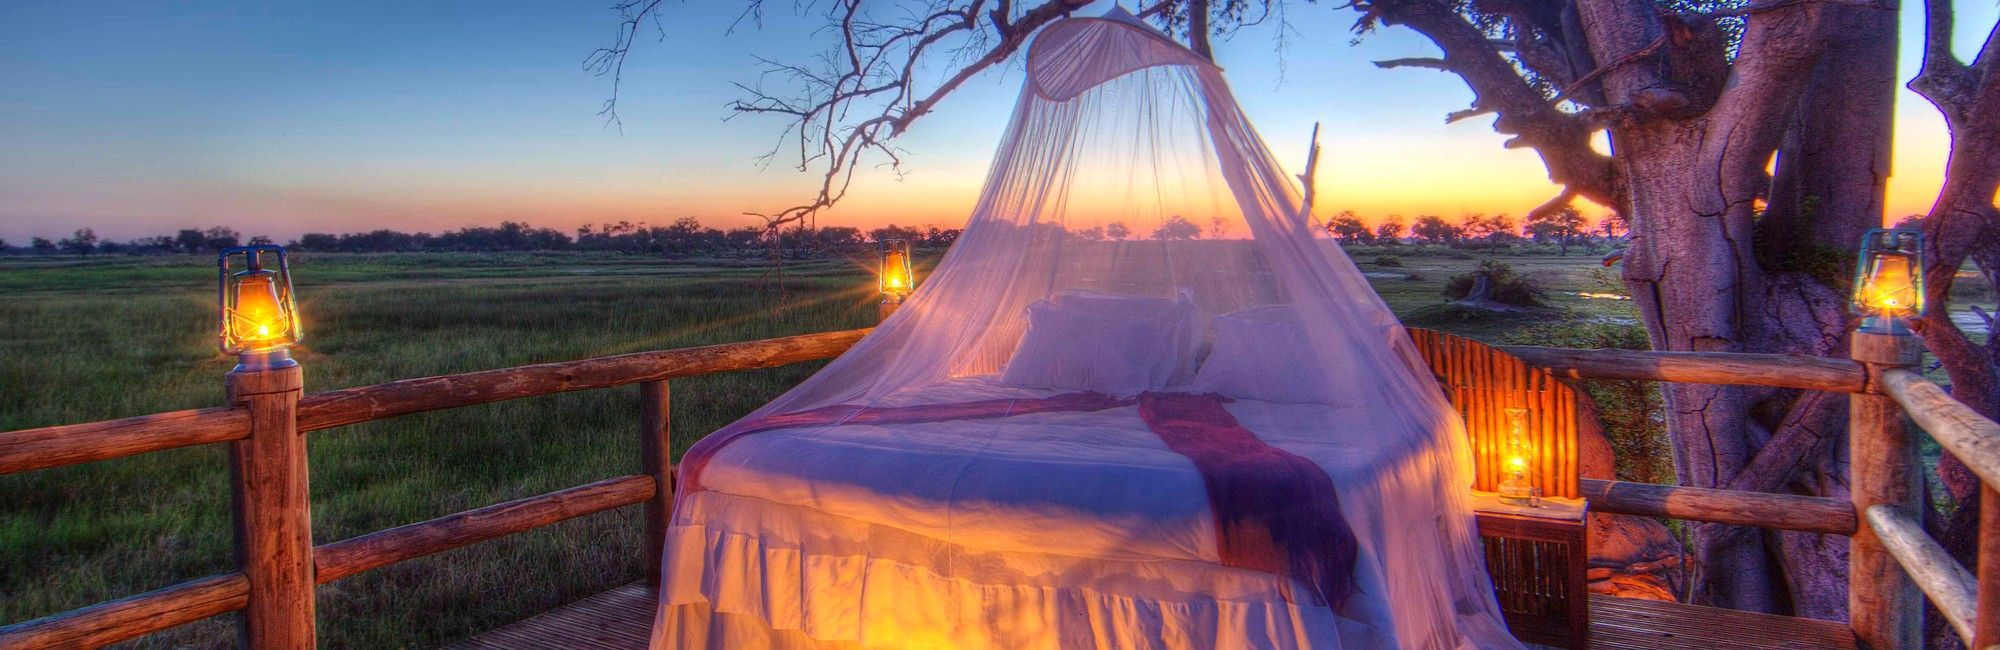 Luxe rondreis Namibie en Botswana